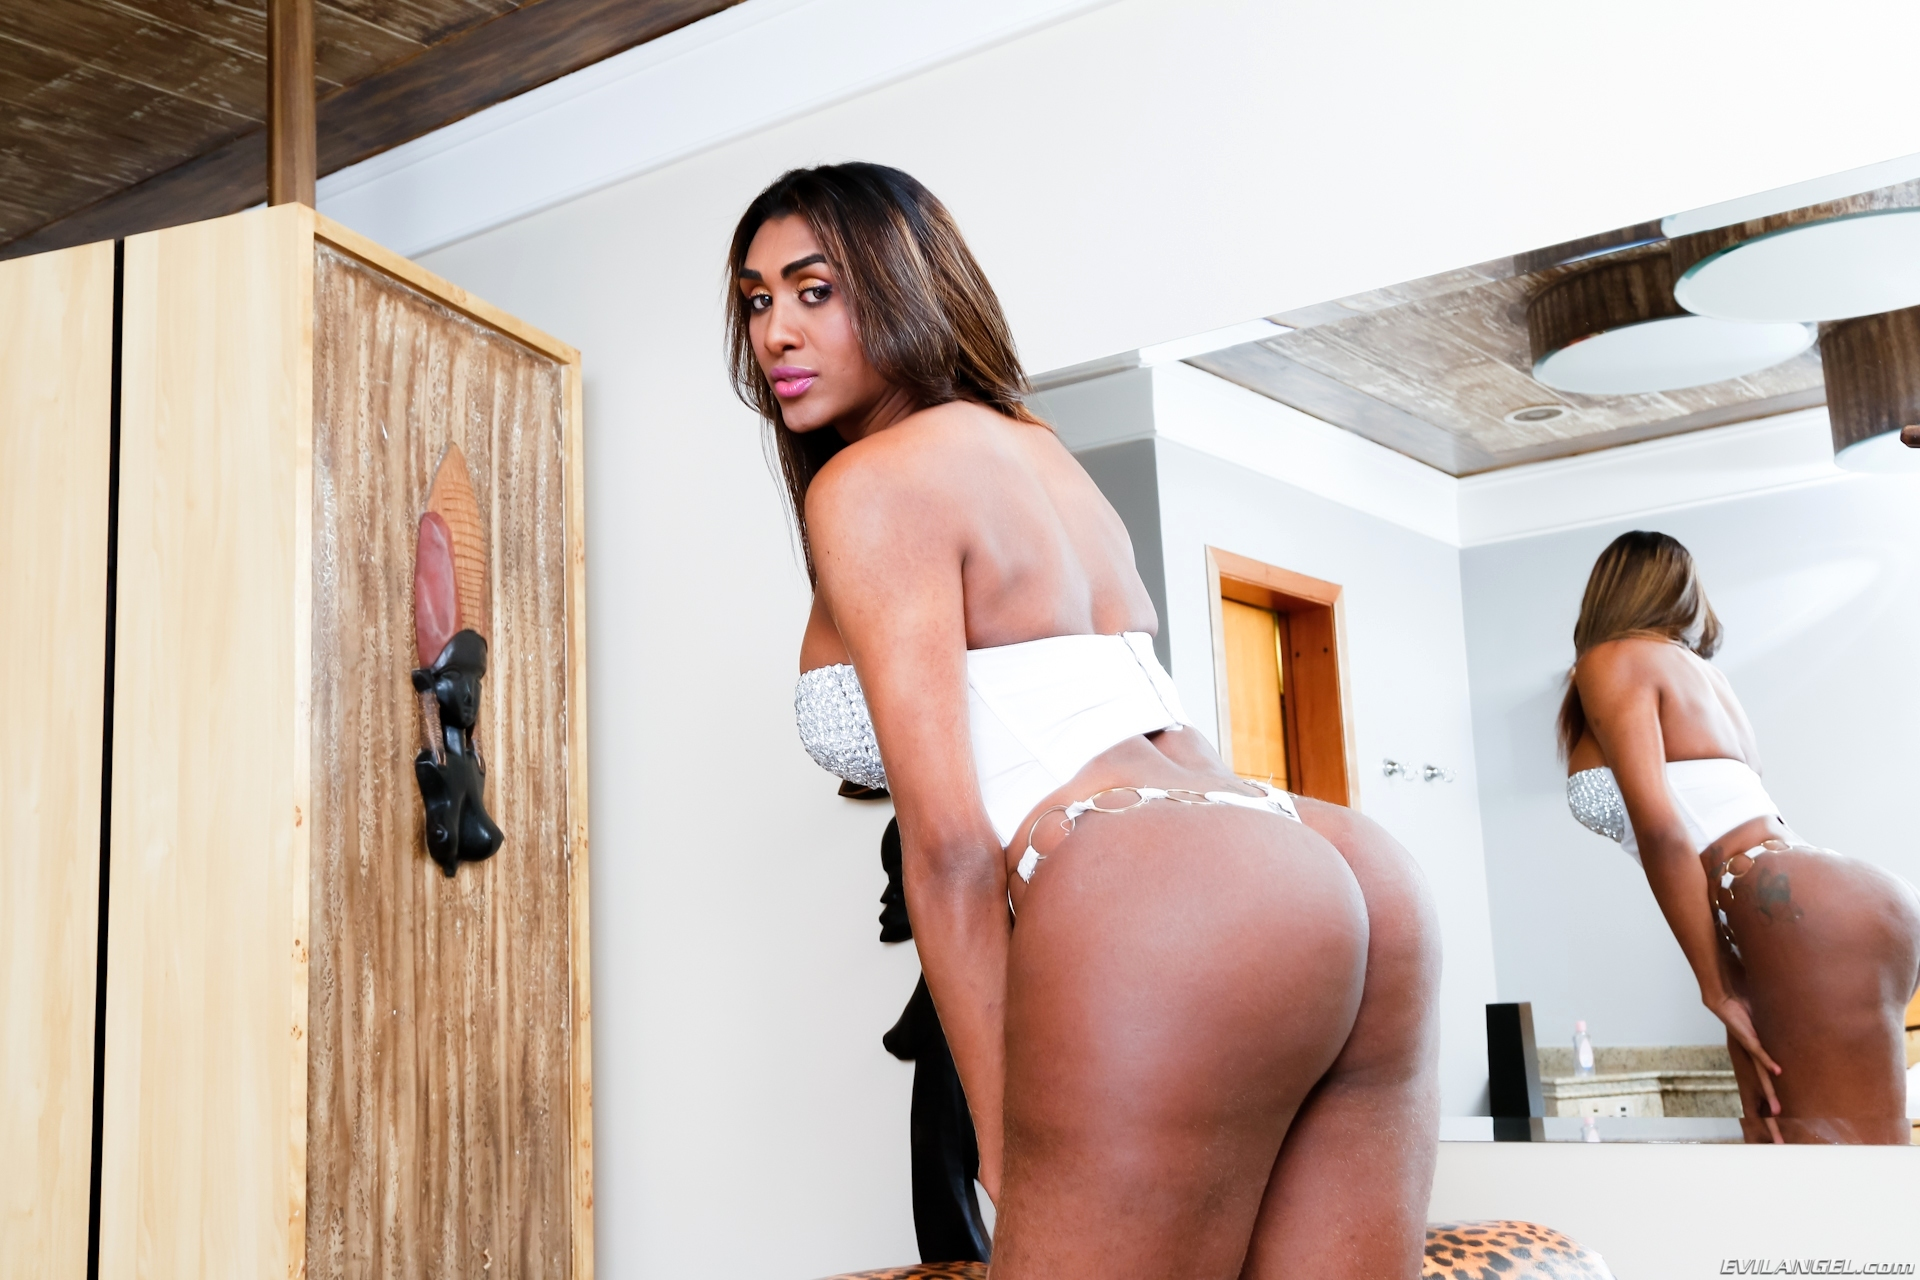 daphynne duarth sensual brazilian babe in white corset